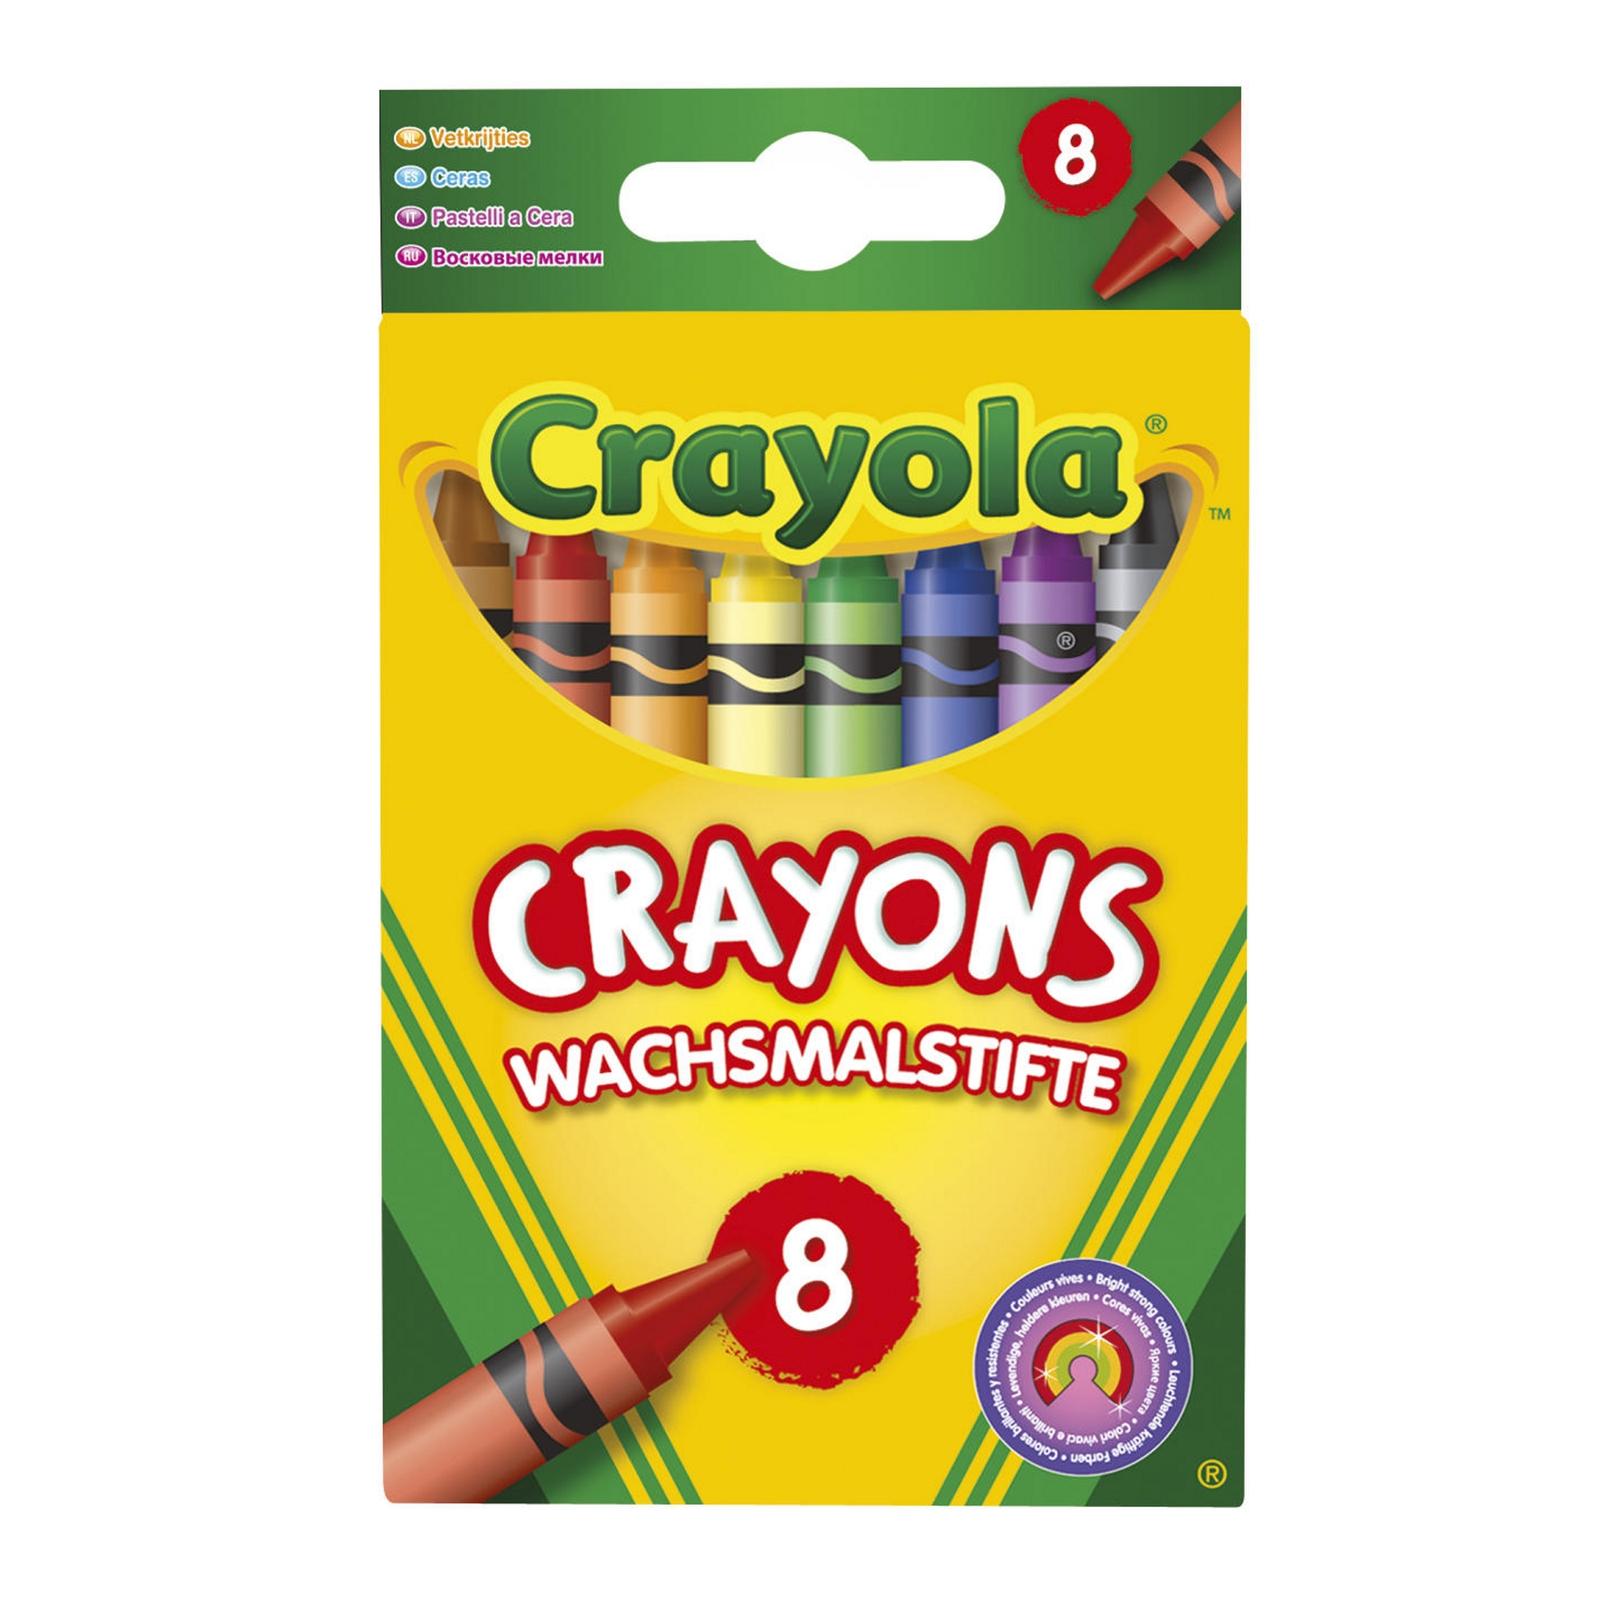 Crayola Crayons Pack of 8